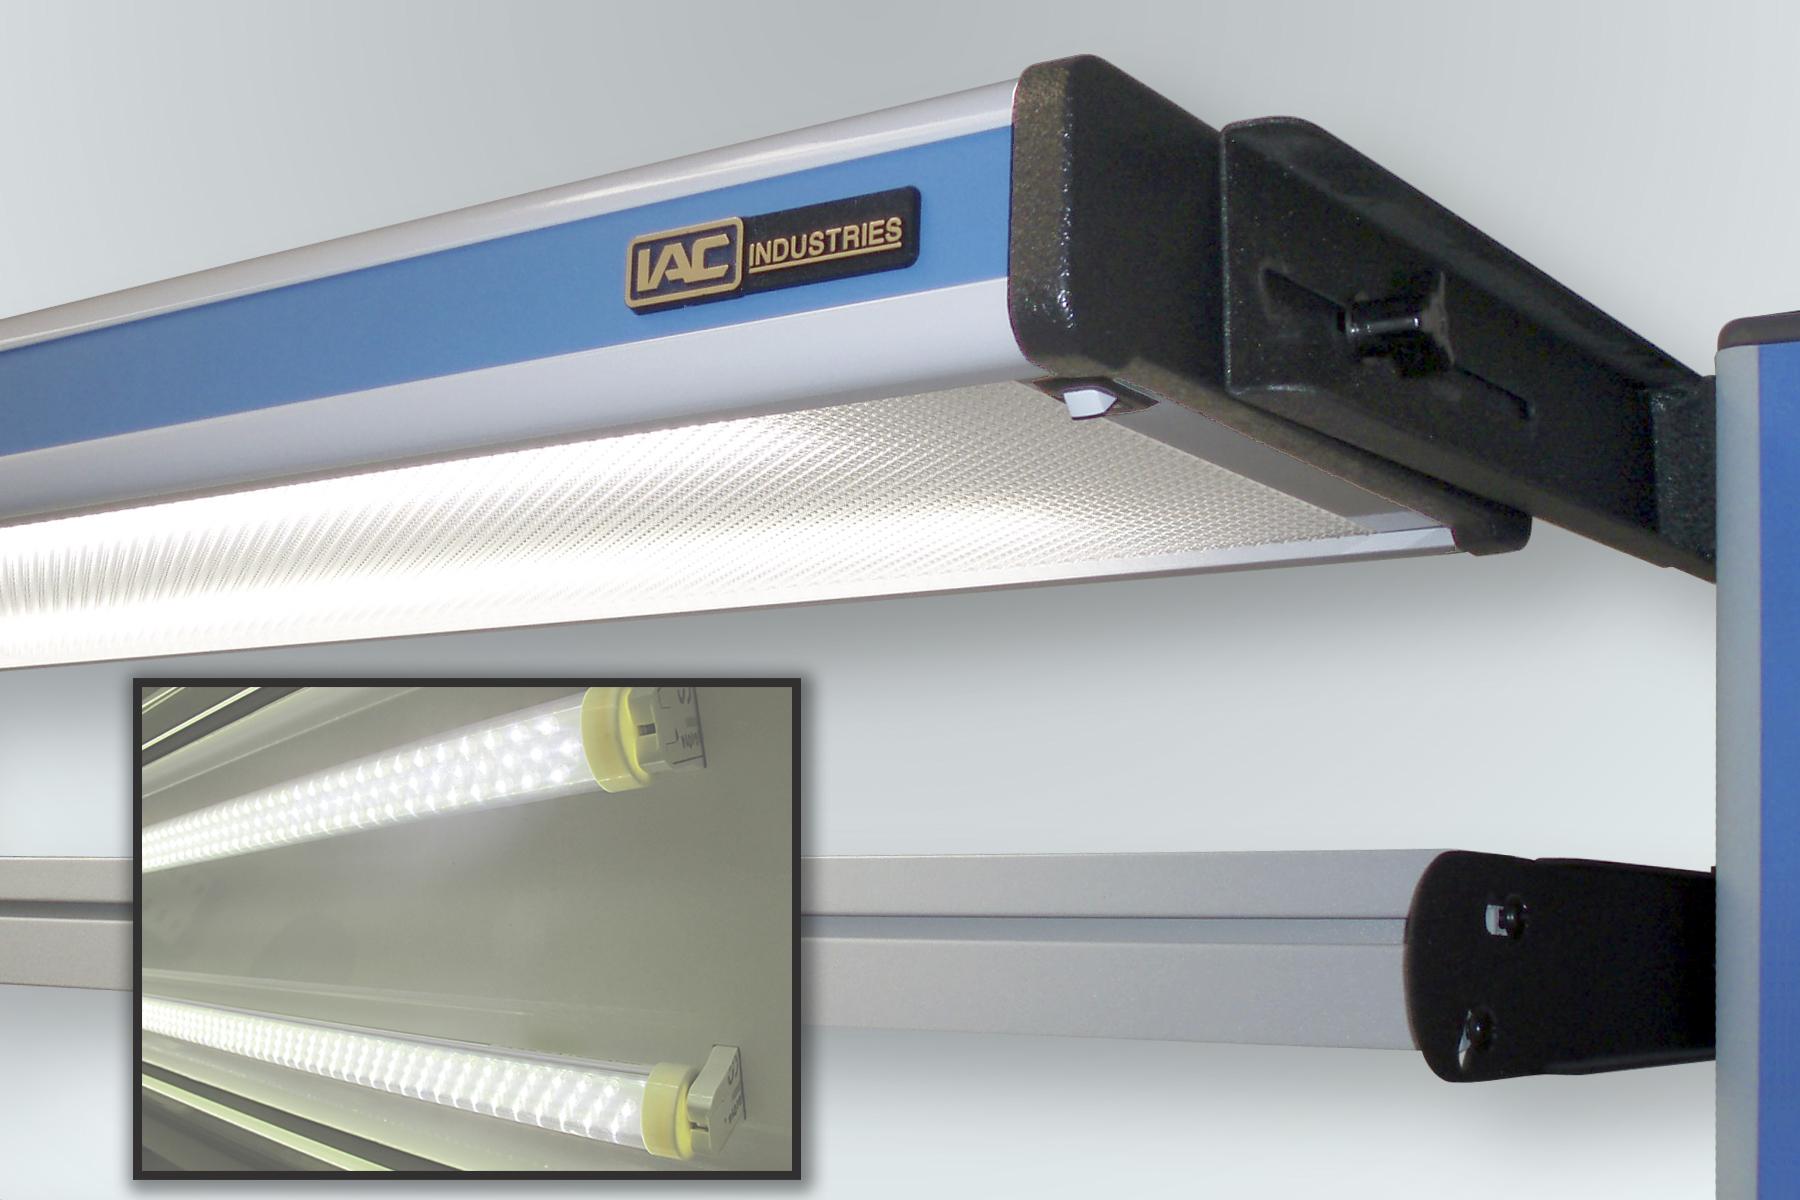 Led Light Bench : Iac industries introduces led workstation adjustable